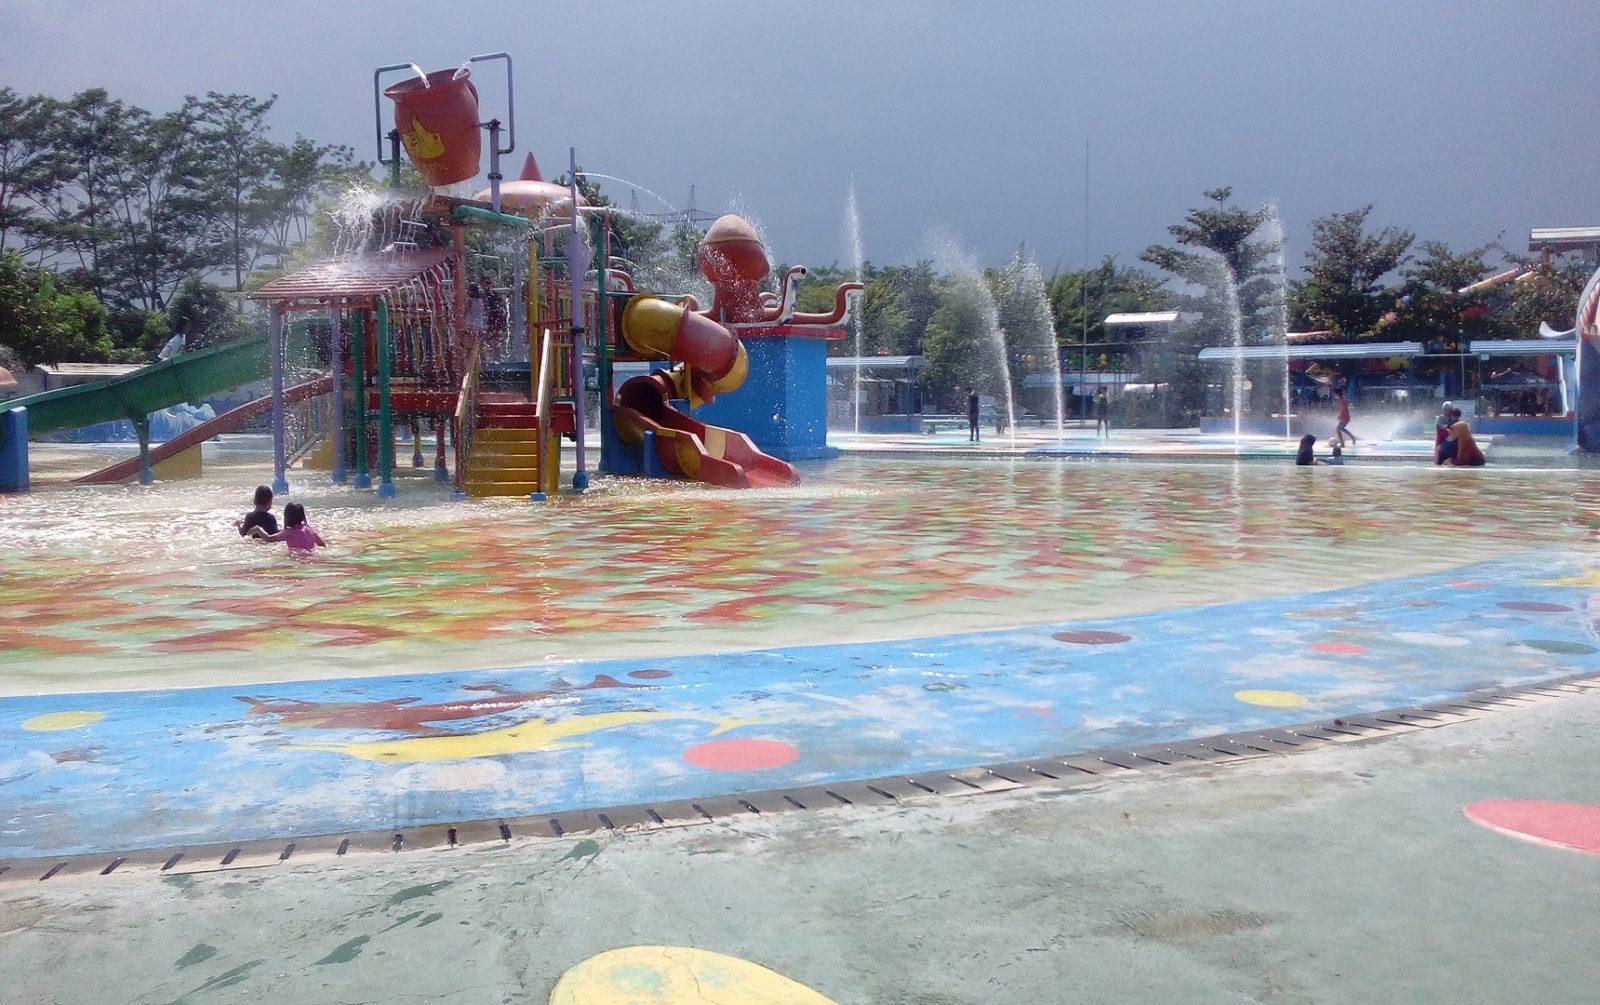 Jempol Waterpark Tiket Wahana Januari 2020 Travelspromo